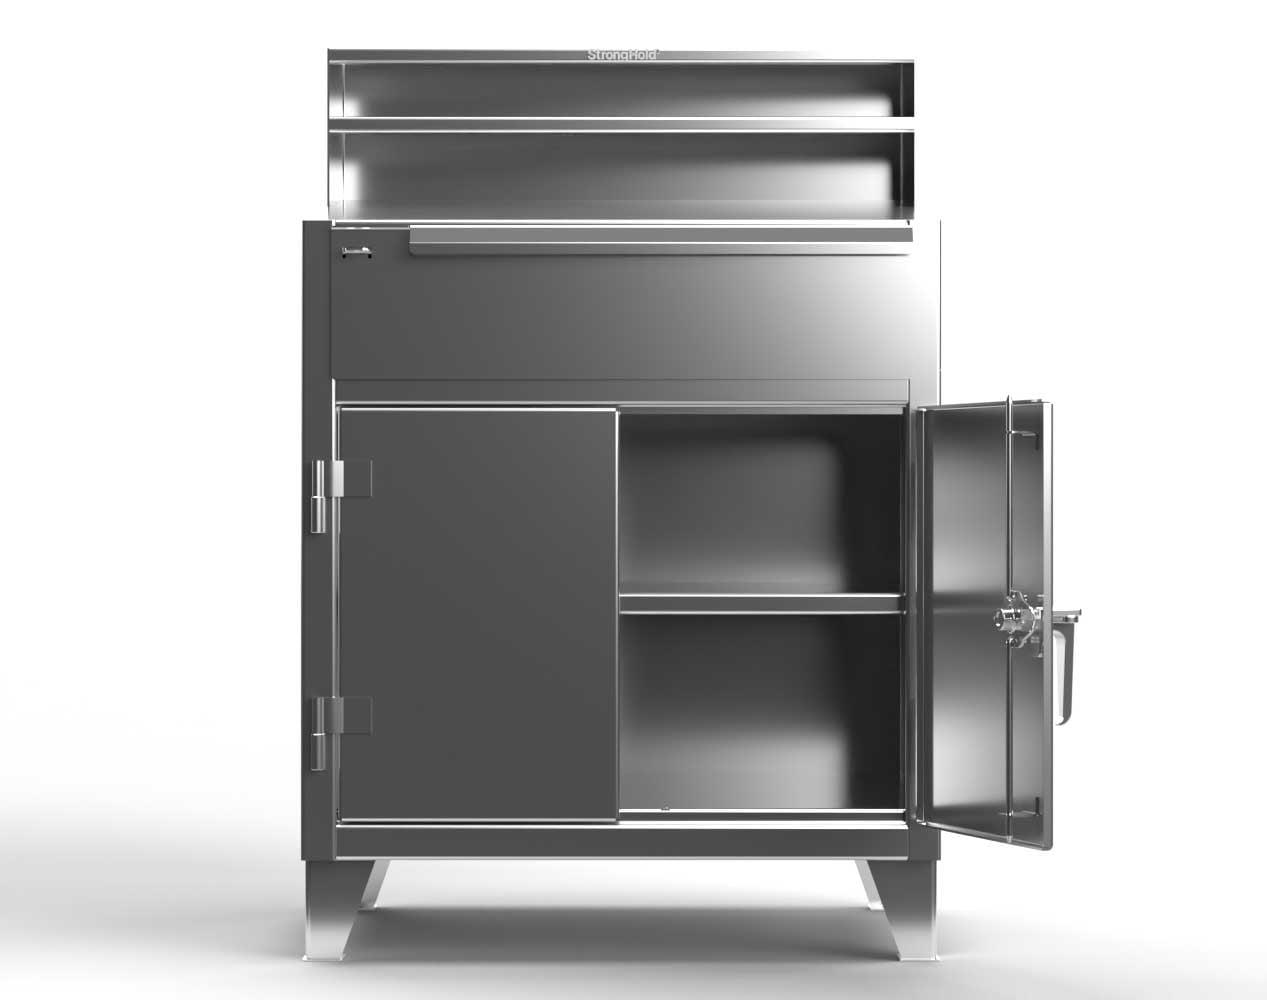 Extra Heavy Duty 12 GA Stainless Steel Shop Desk with 1 Drawer, 1 Shelf, Riser Shelf – 36 In. W x 28 In. D x 54 In. H